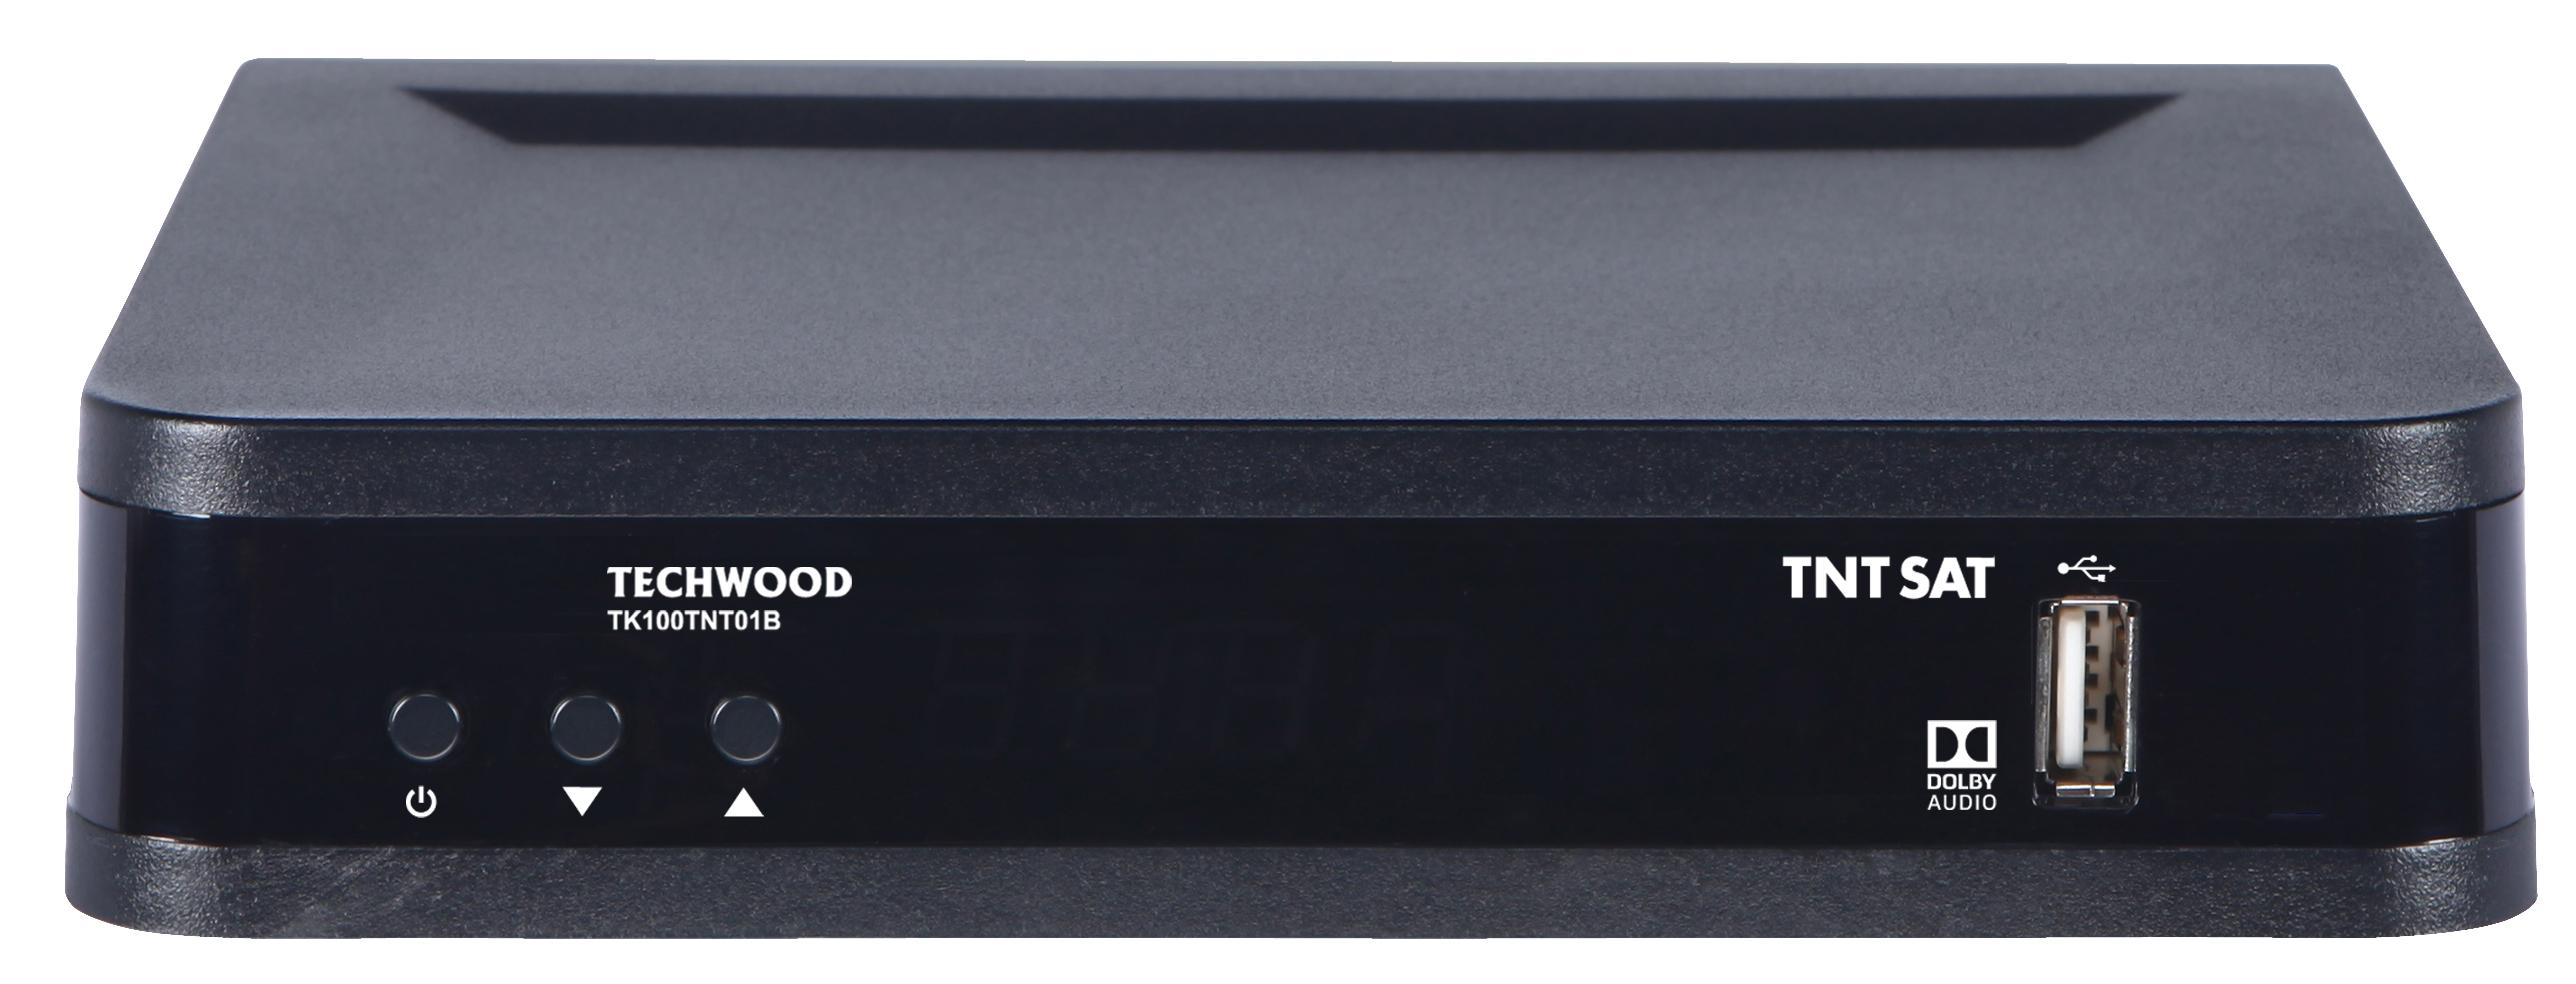 récepteur satellite techwood tntsat hd tk100tnt01b